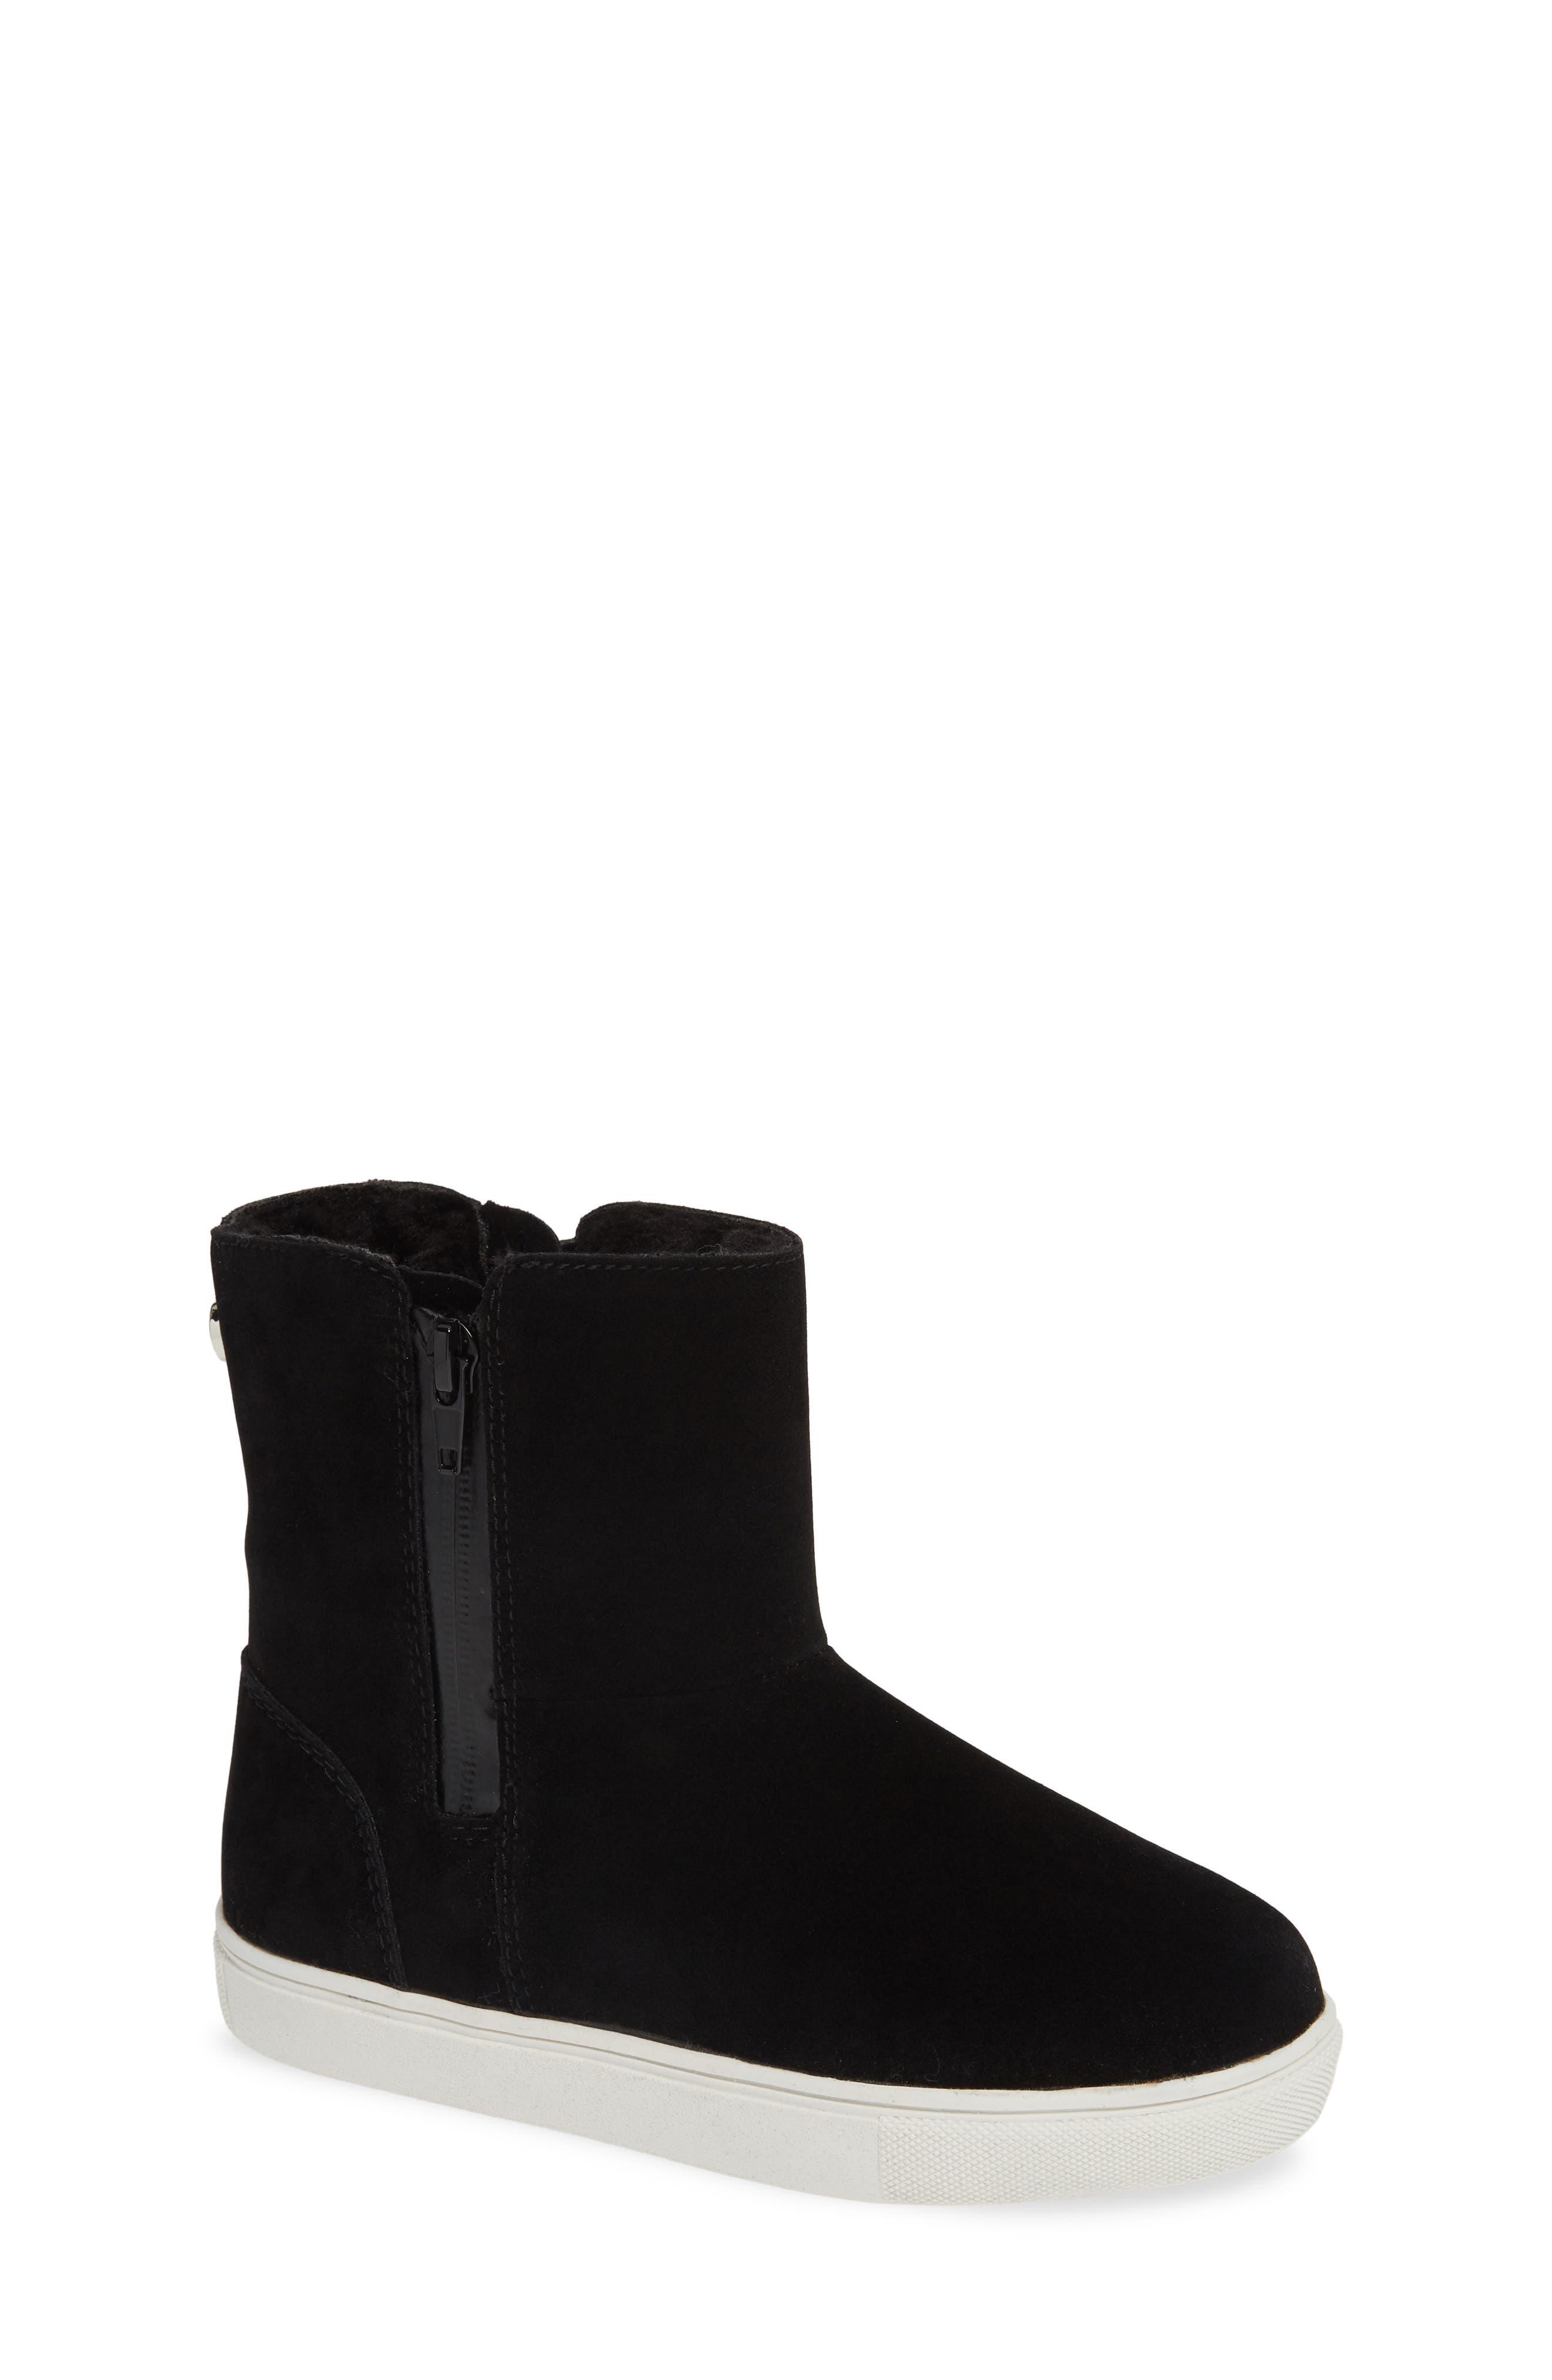 STEVE MADDEN JGarrison Waterproof Boot, Main, color, 001